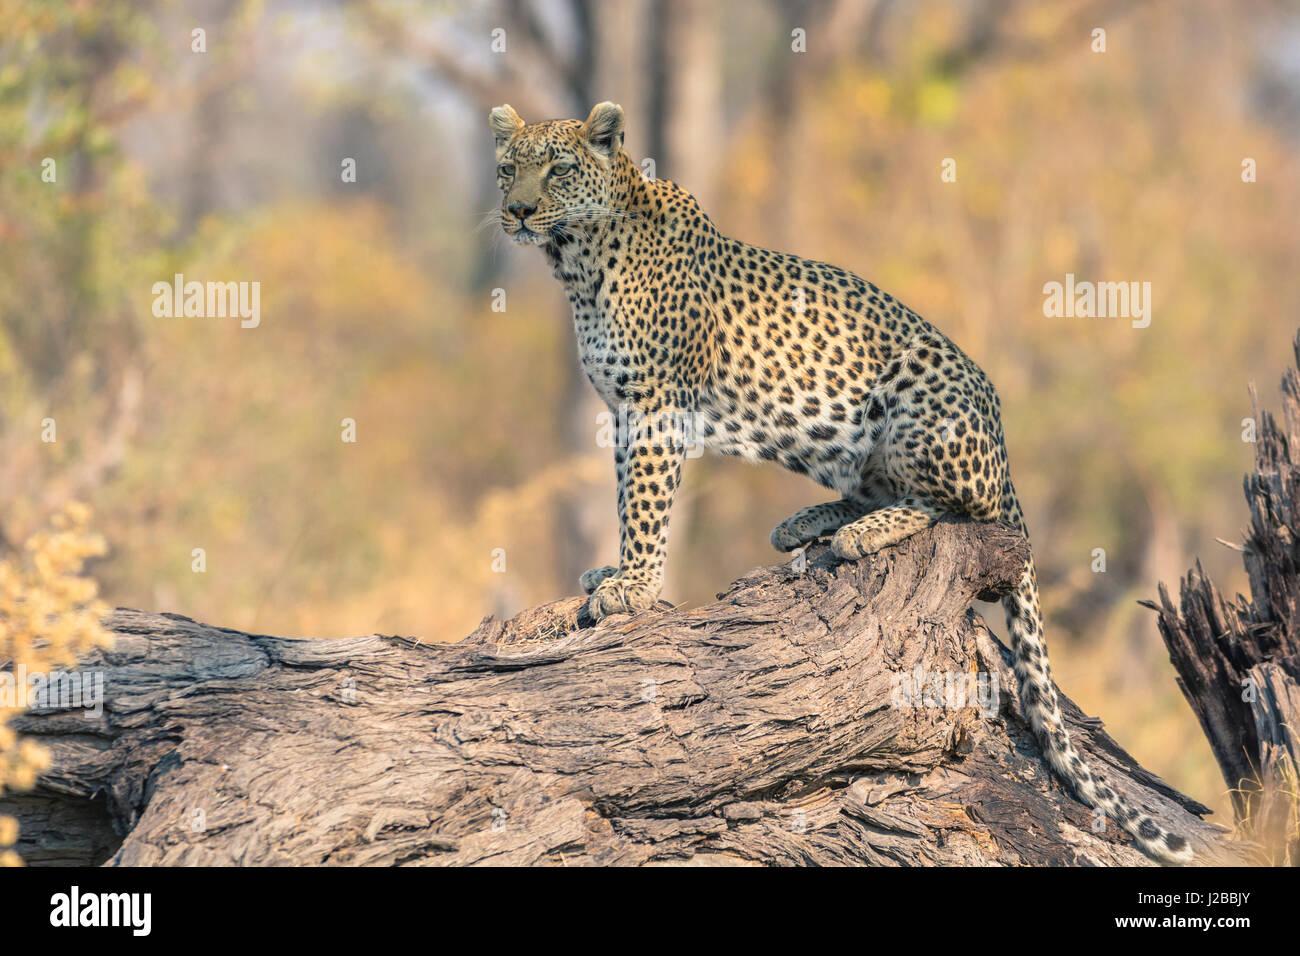 Botswana. Okavango Delta. Khwai concession. Leopard (Panthera pardus) looks out for prey on a fallen log. - Stock Image